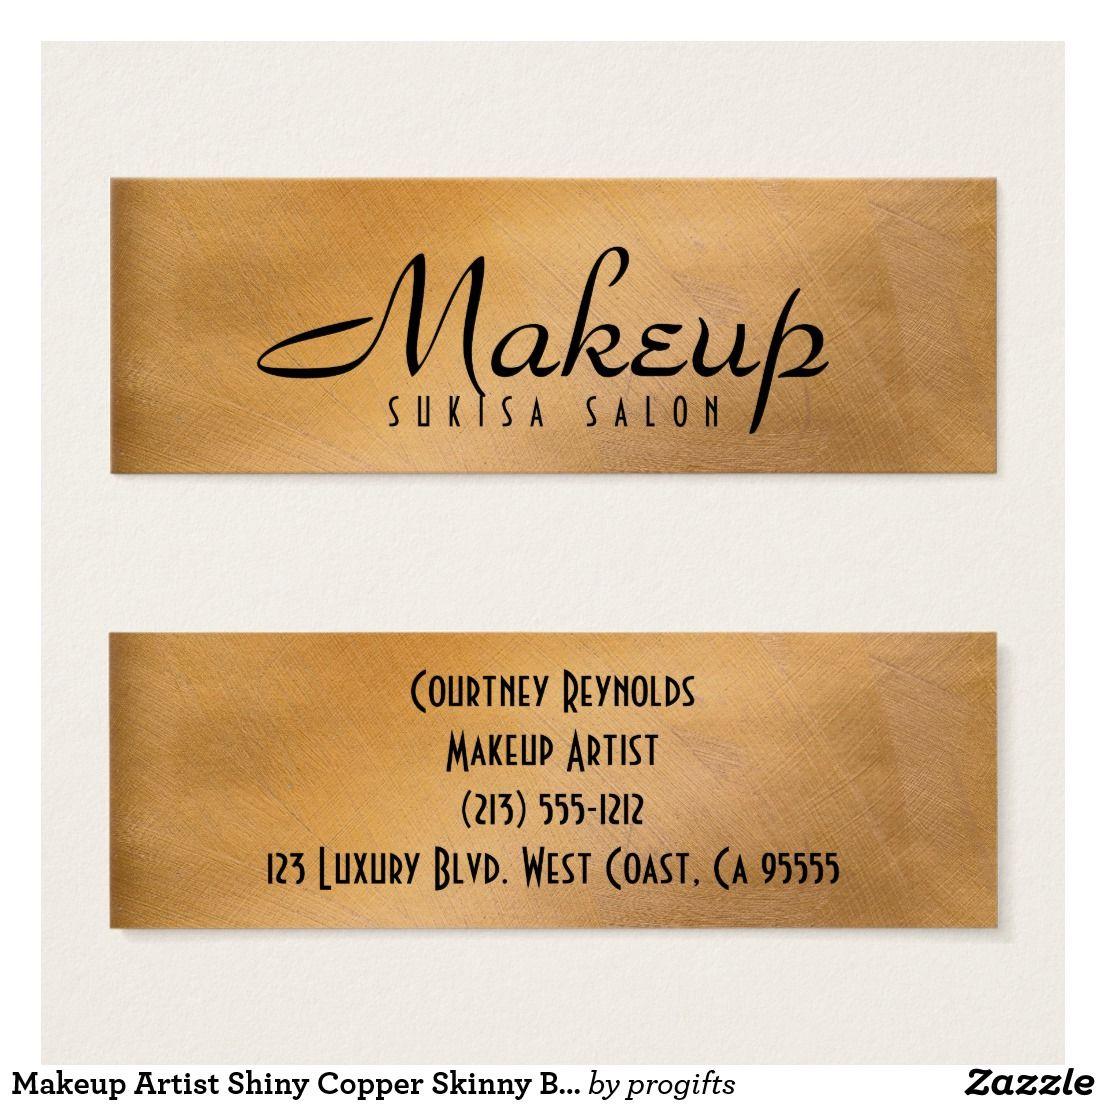 Makeup Artist Shiny Copper Skinny Business Cards